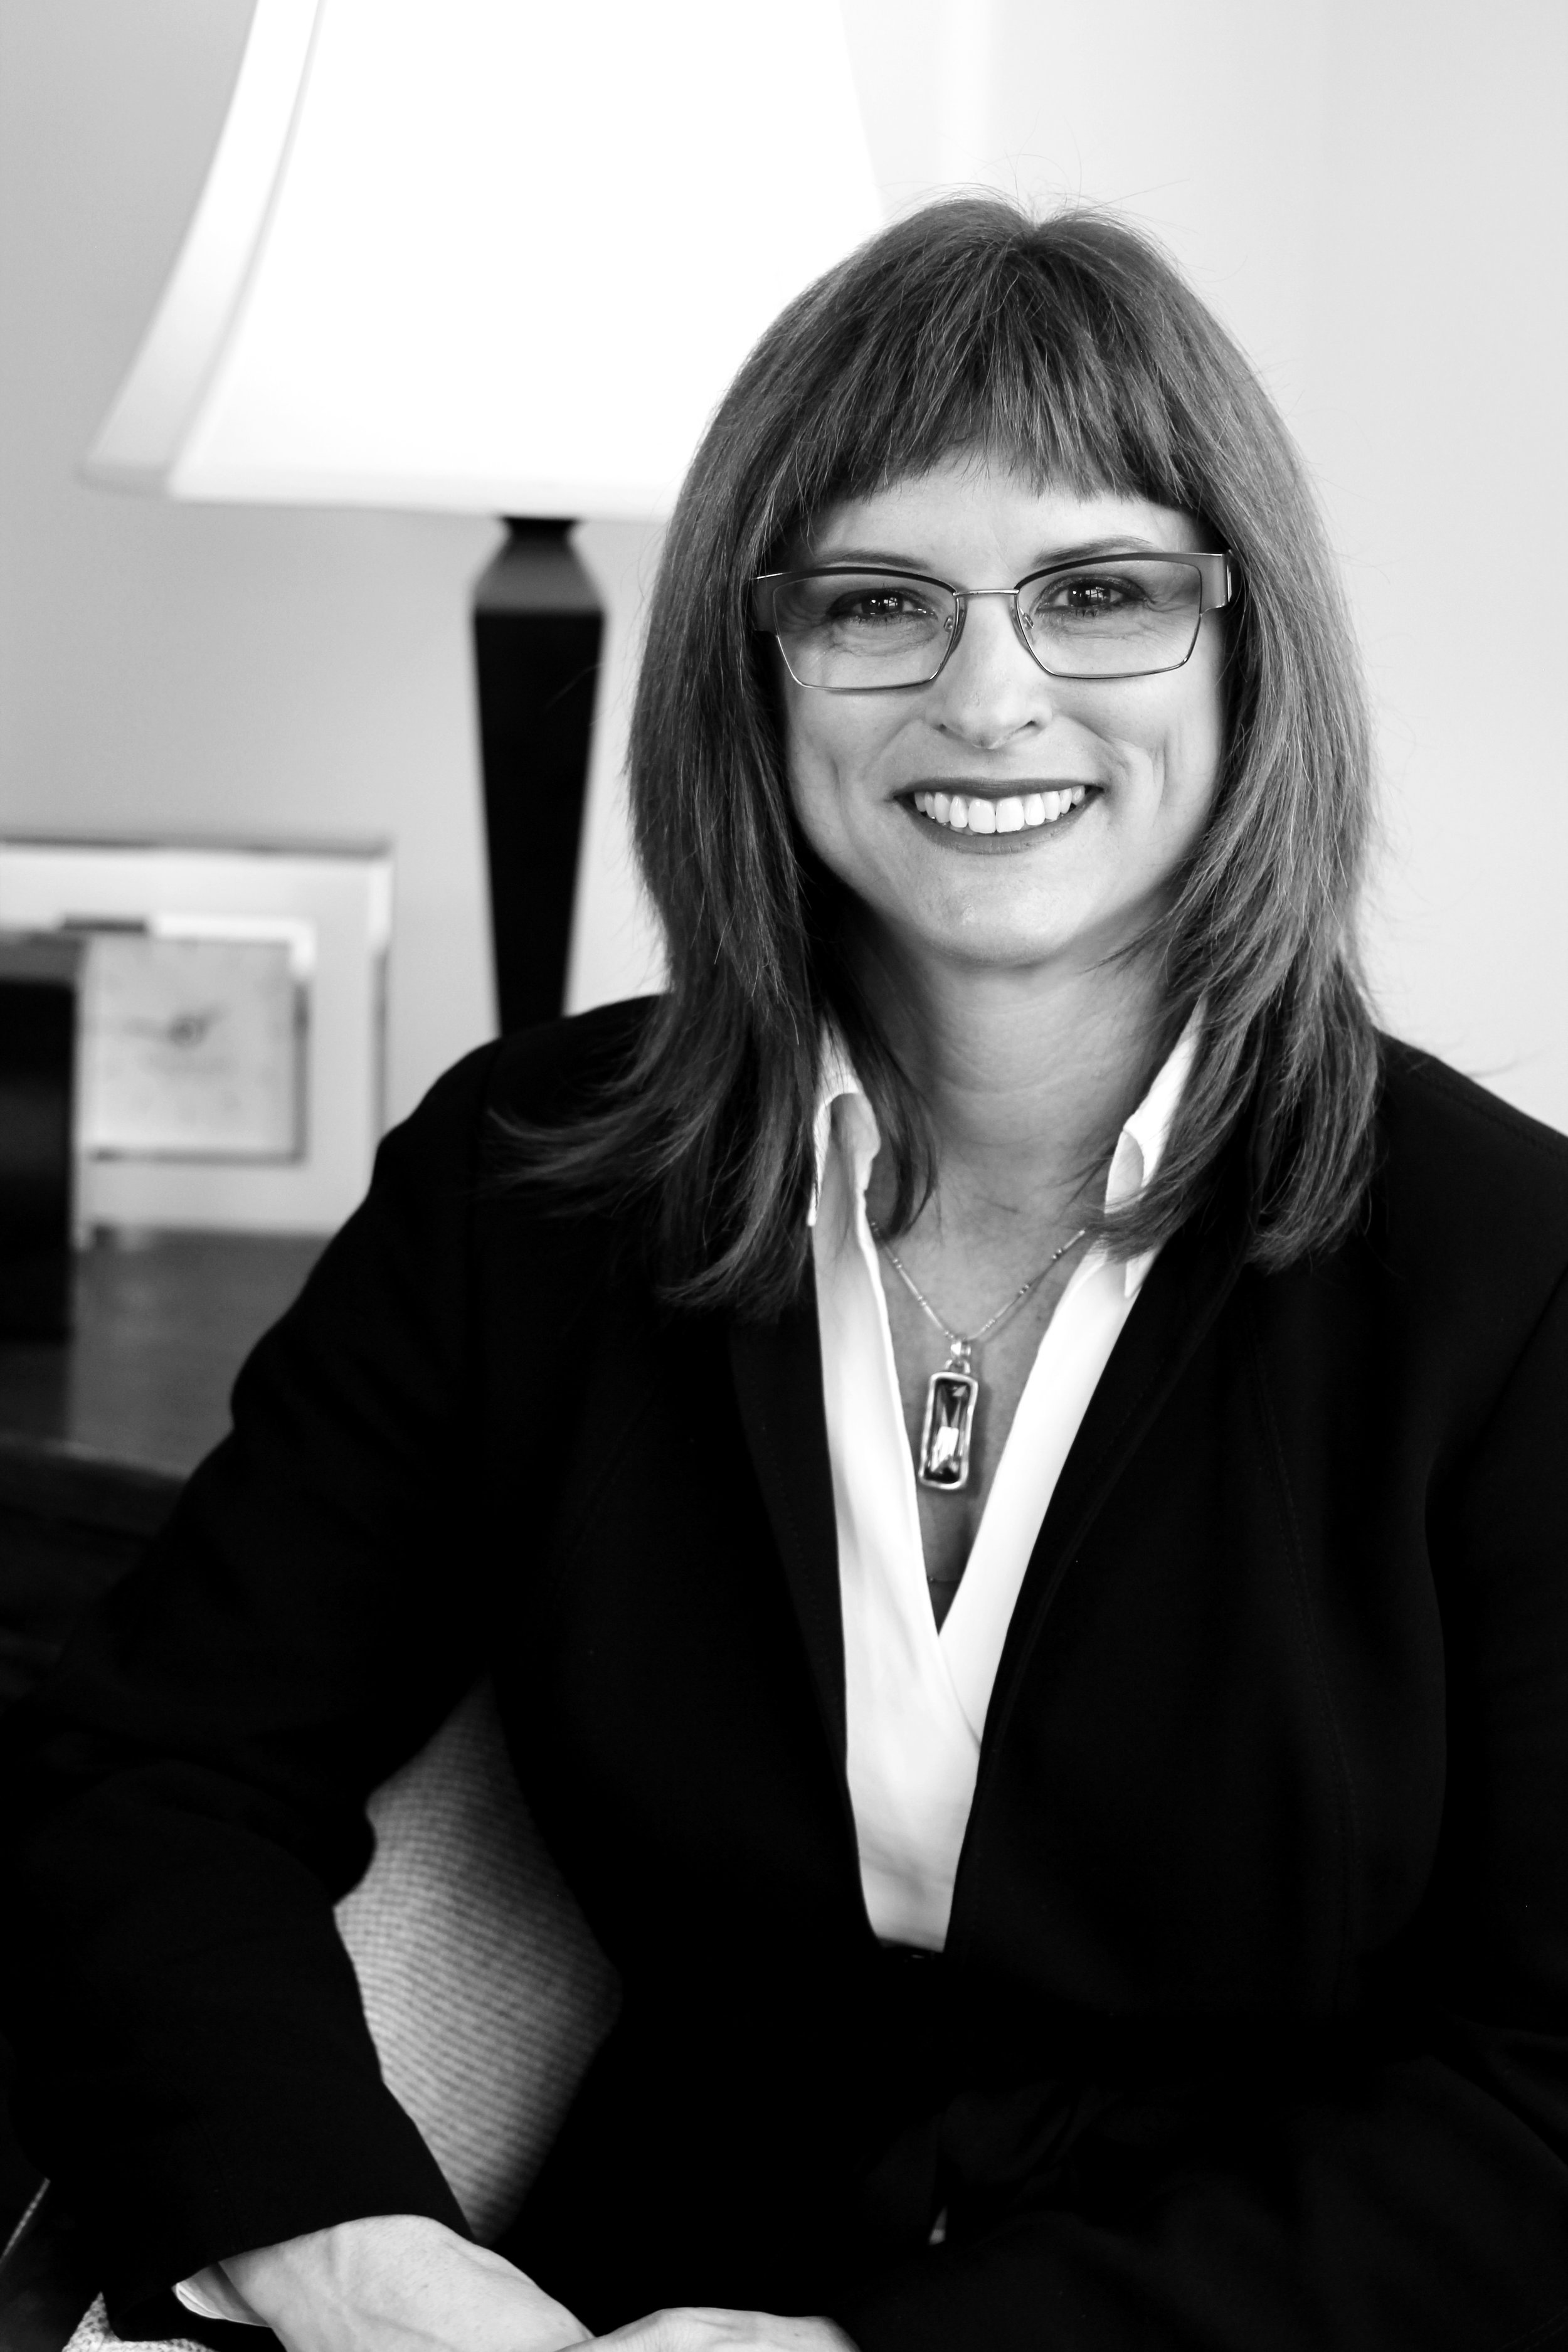 Lisa W. Haydon